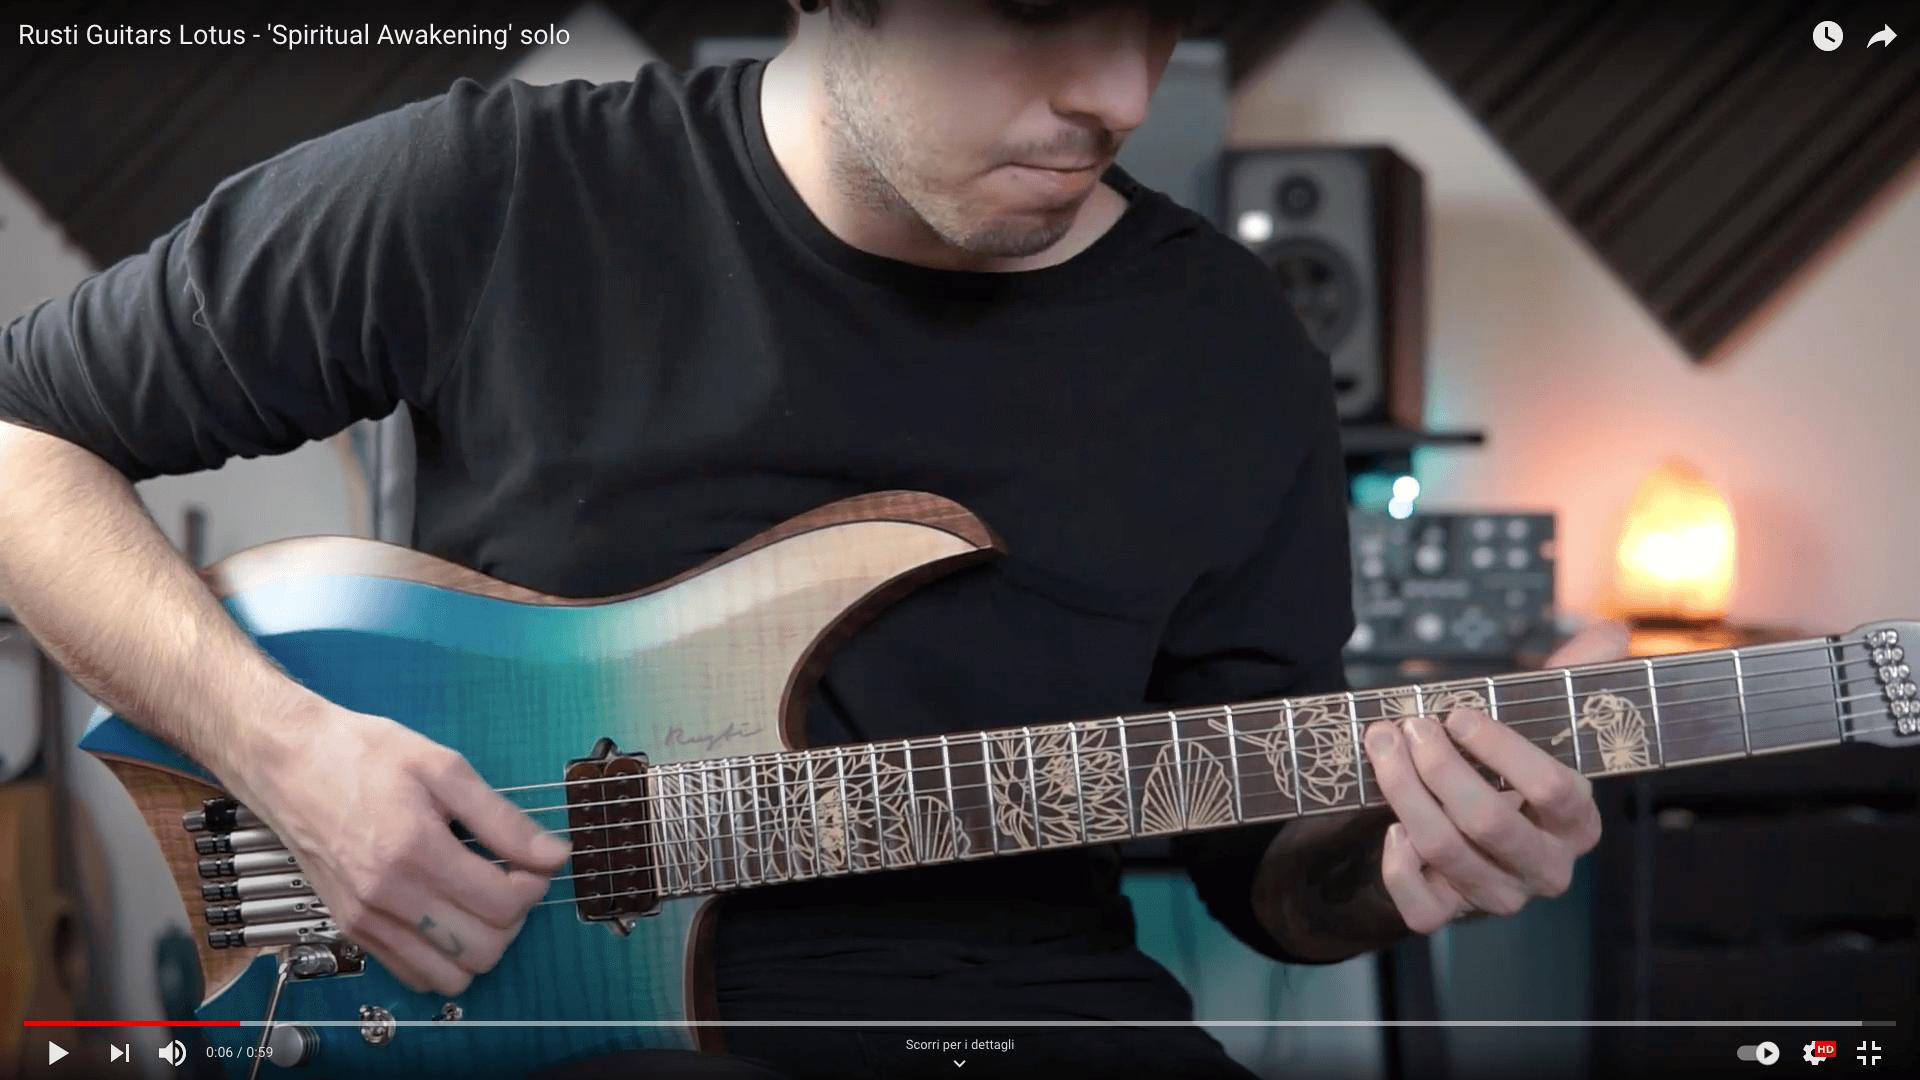 Rusti Guitars Lotus - 'Spiritual Awakening' solo